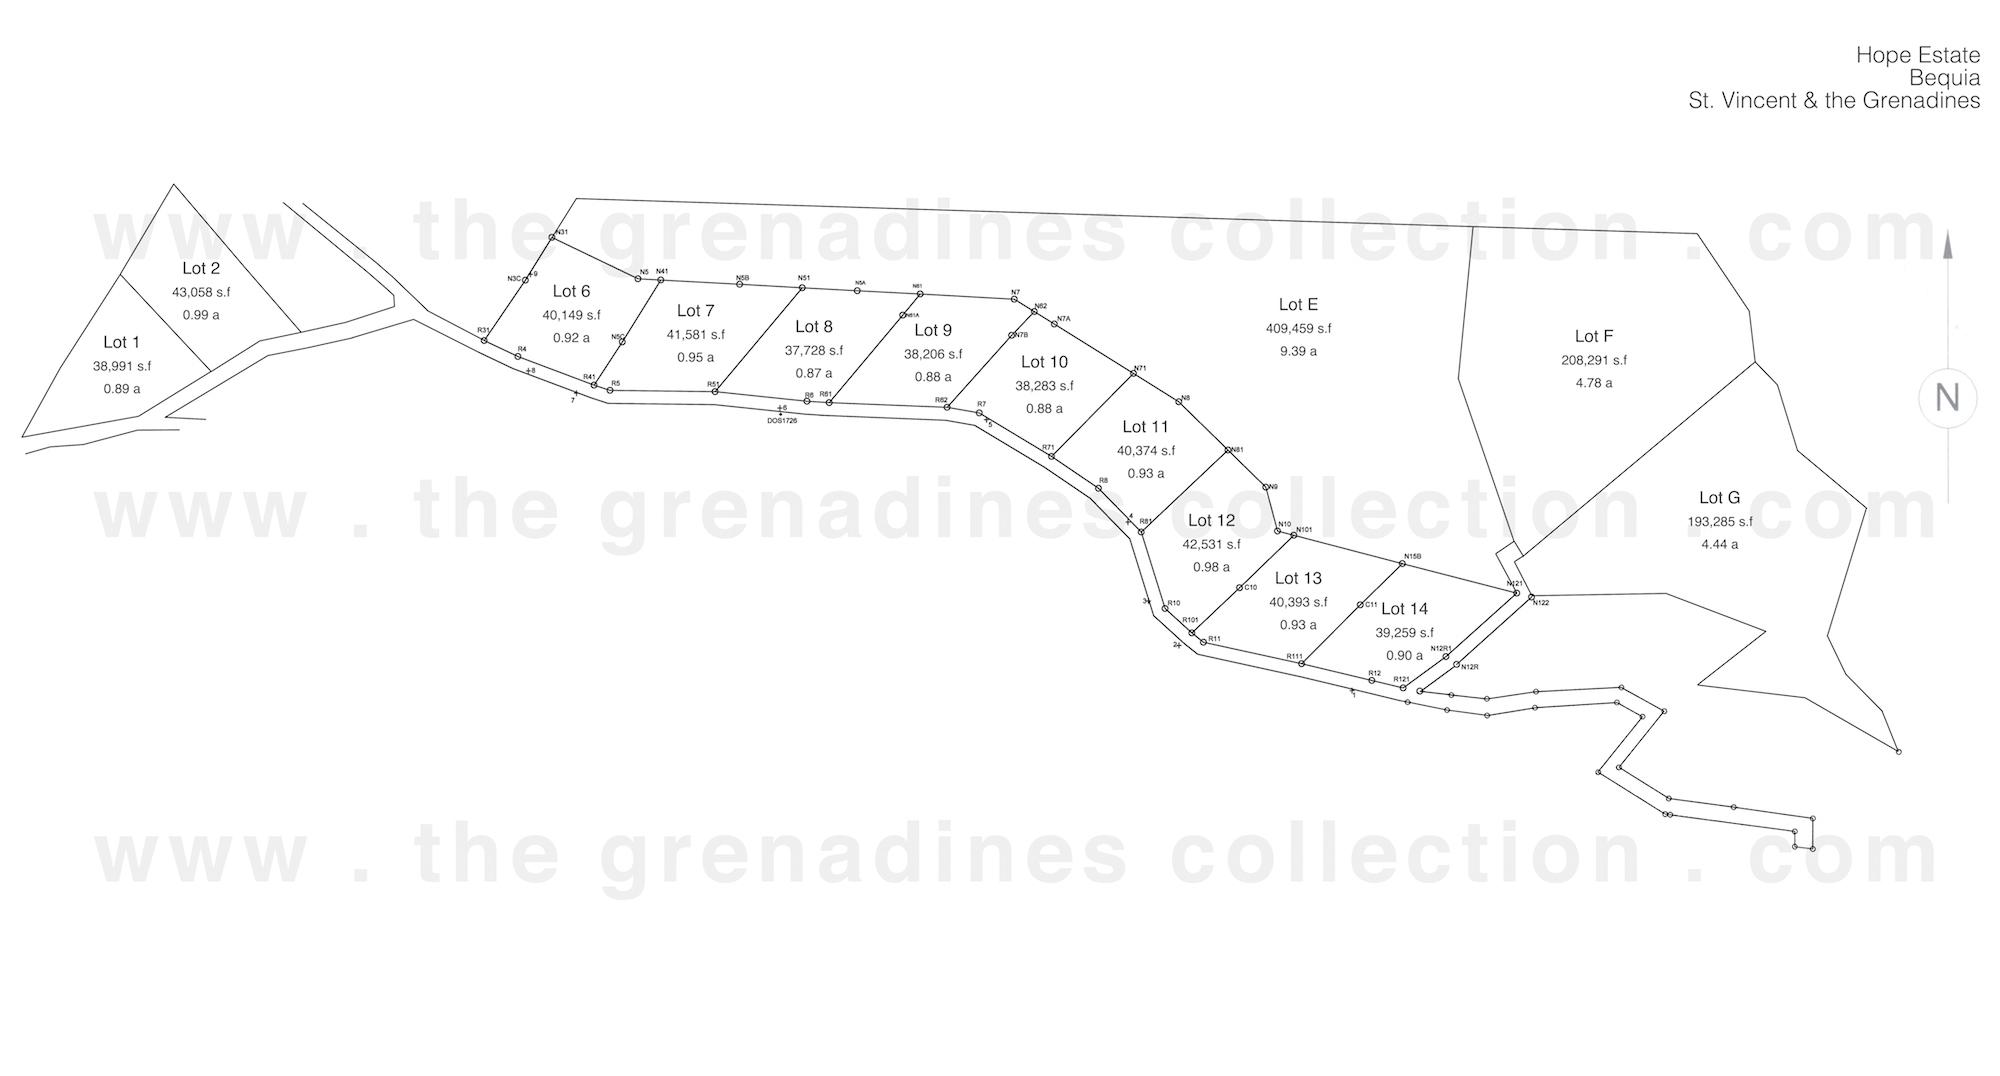 TheGrenadinesCollection